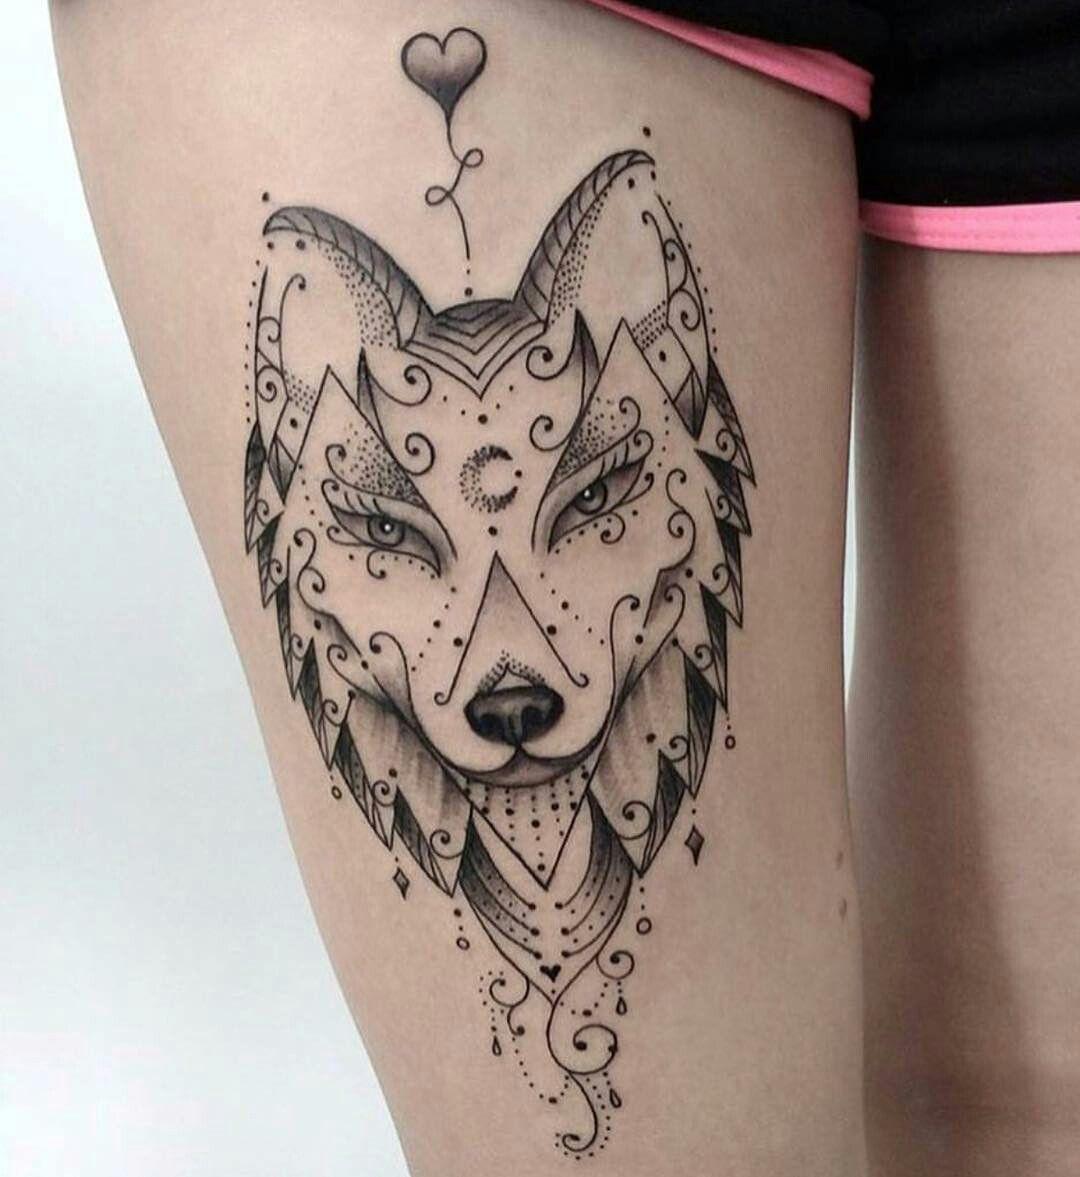 Tatuagem feminina de Katri Heinänen em Tattoo Tatuagem